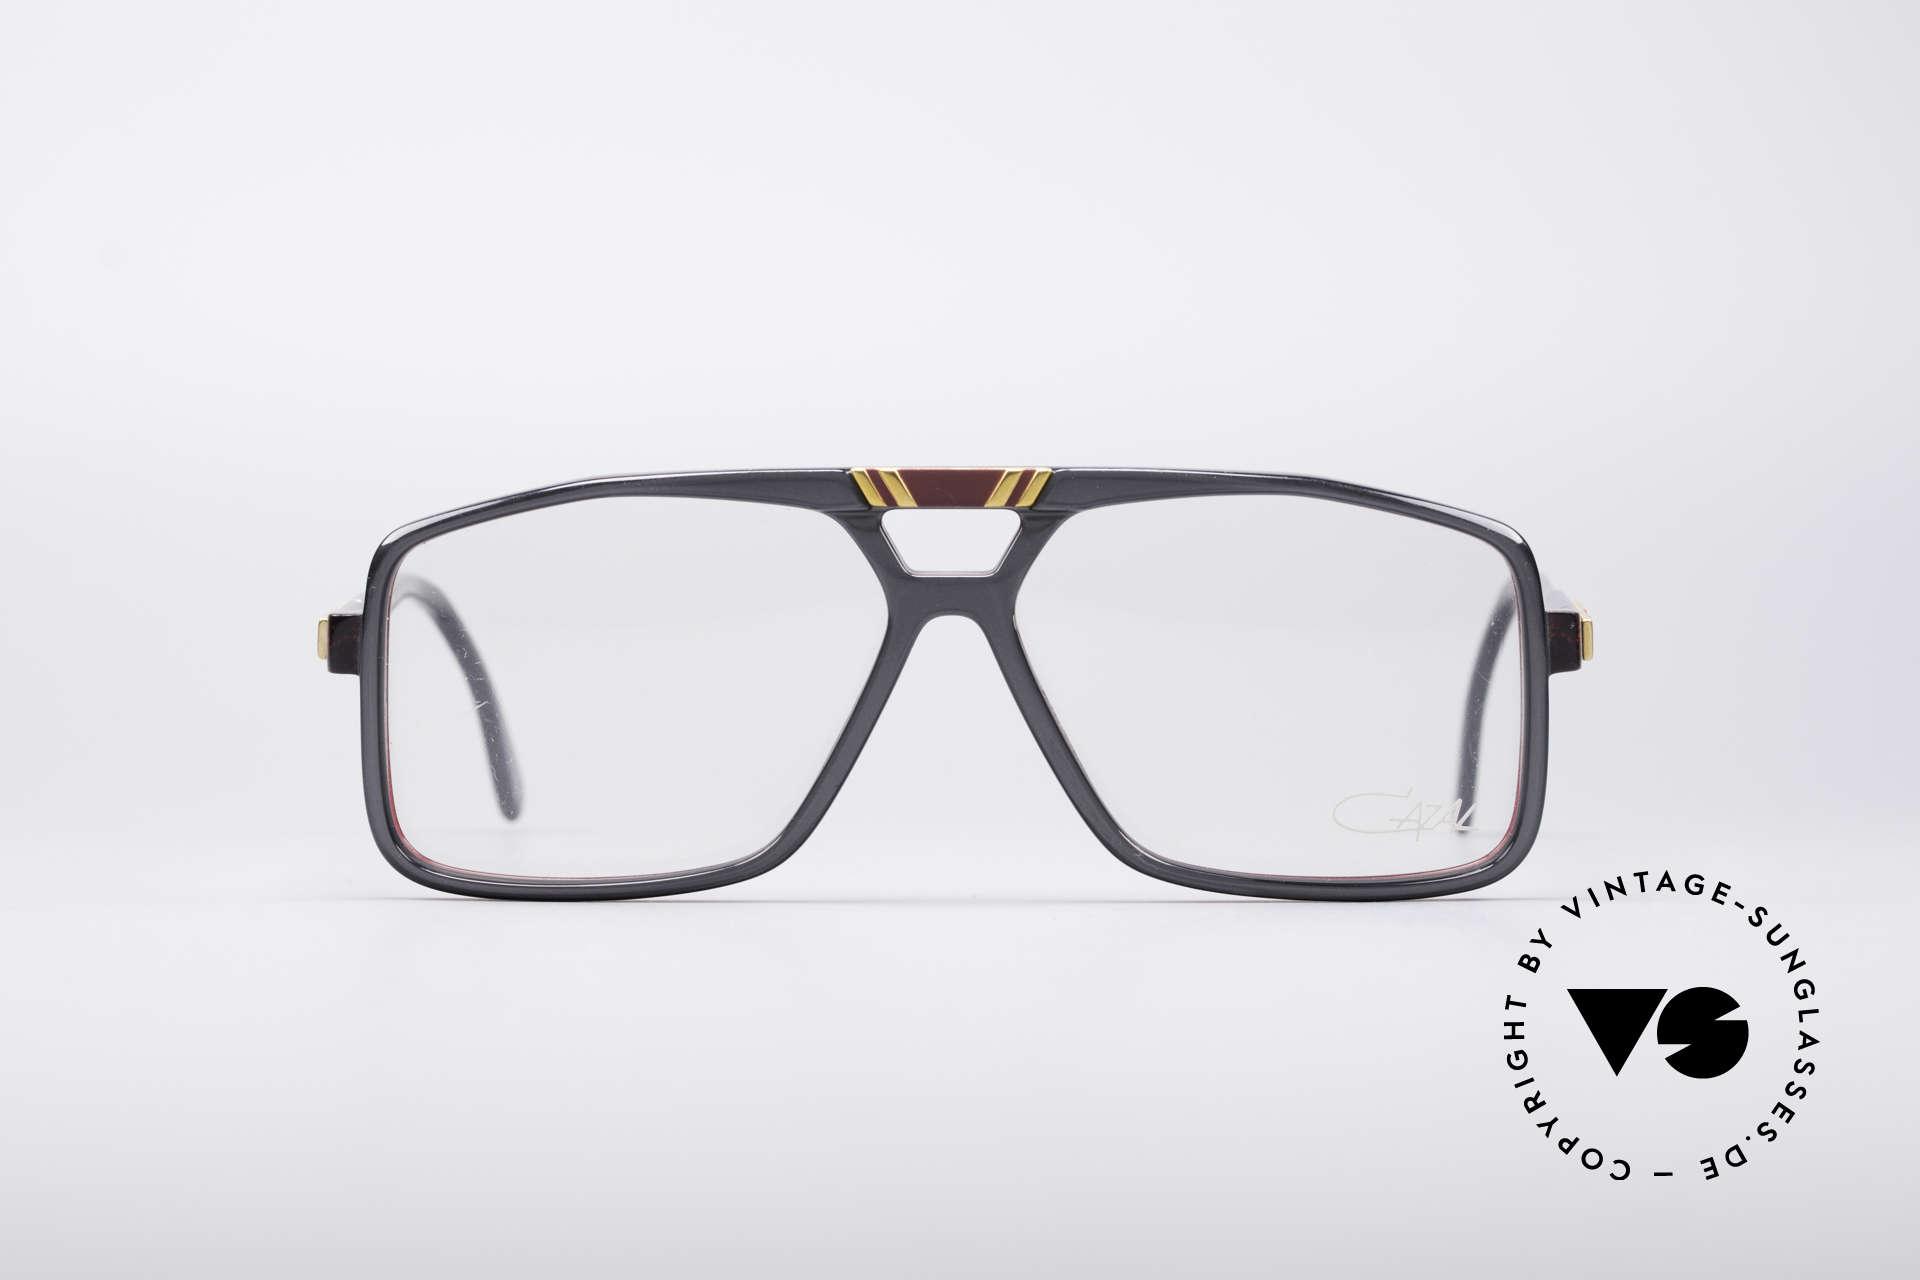 d9ca9c83ec8 Glasses Cazal 637 80 s Hip Hop Eyeglasses